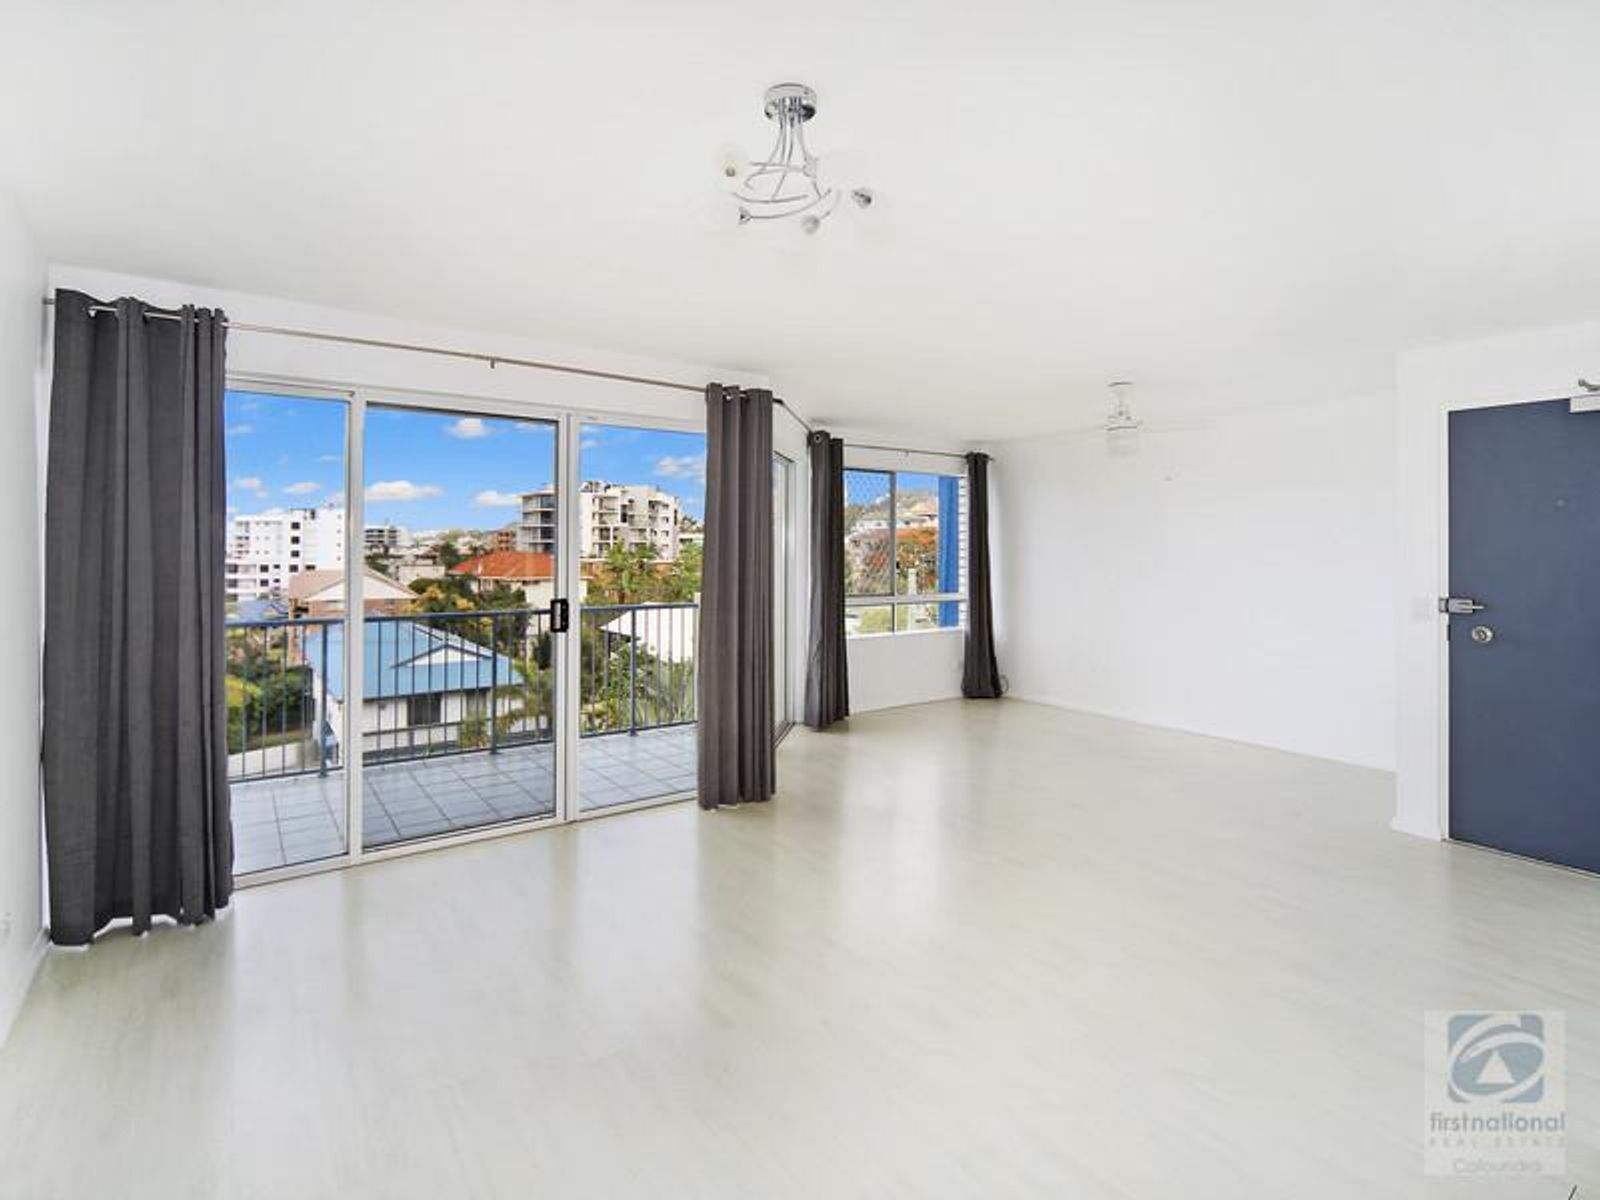 10/15 Verney Street, Kings Beach, QLD 4551